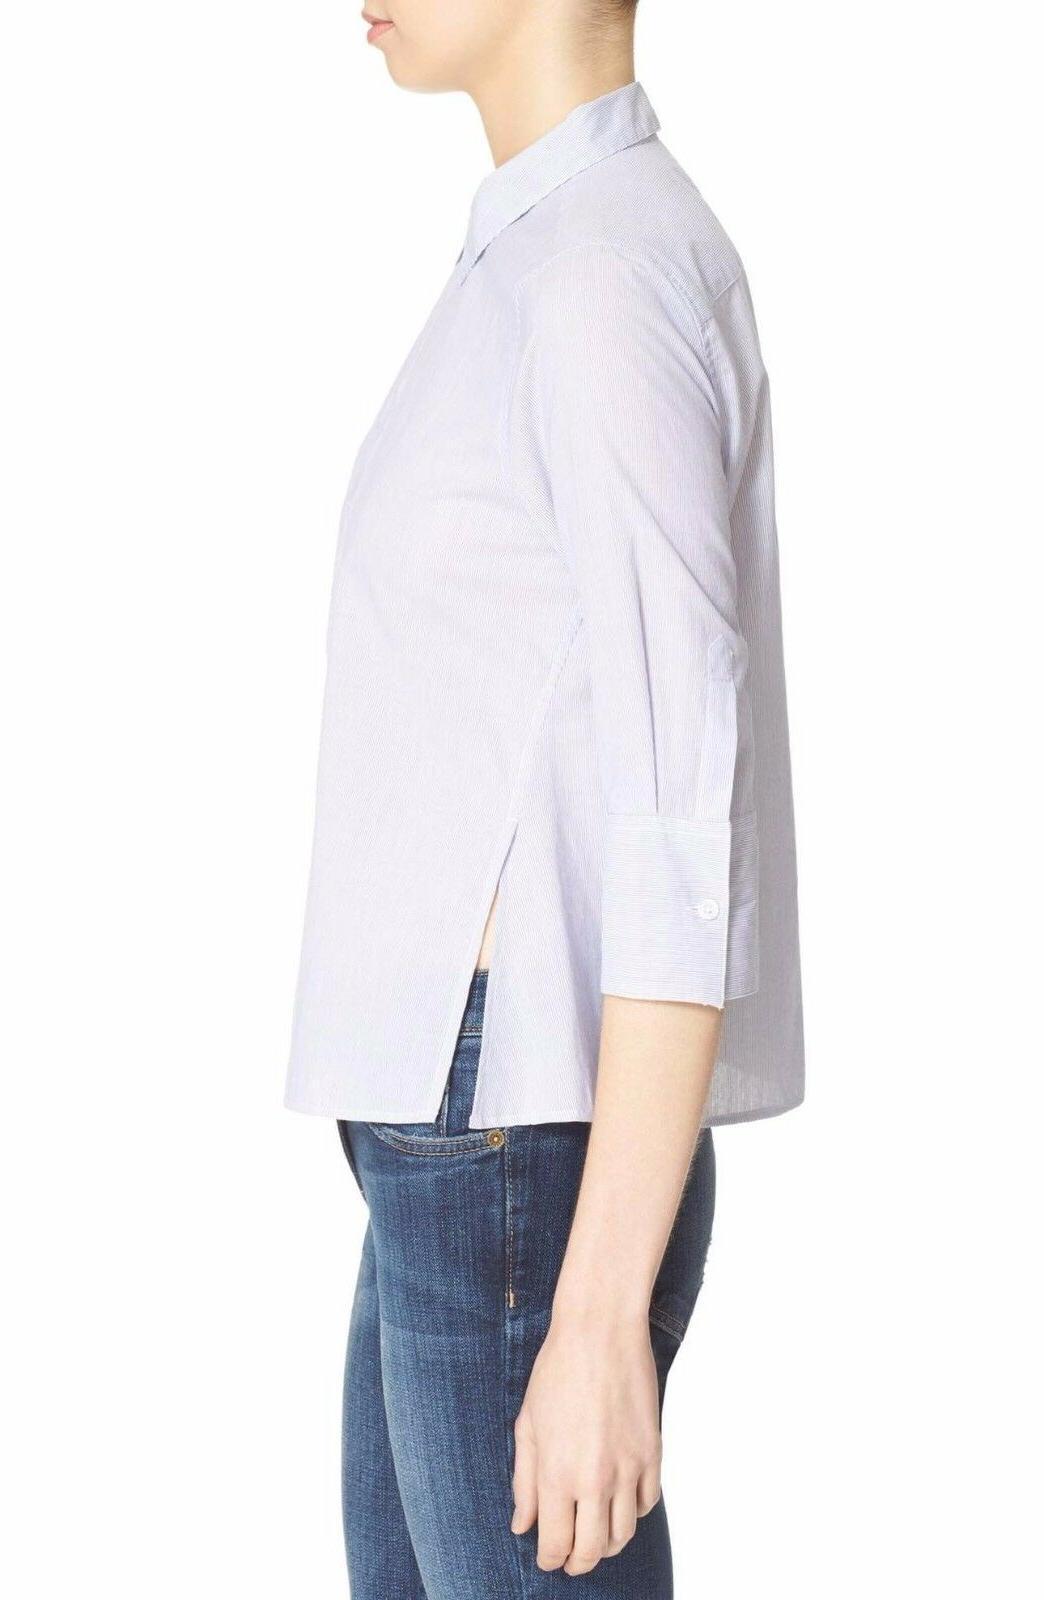 Equipment 'Esme' Microsoft Shirt Size Blue/White NWT